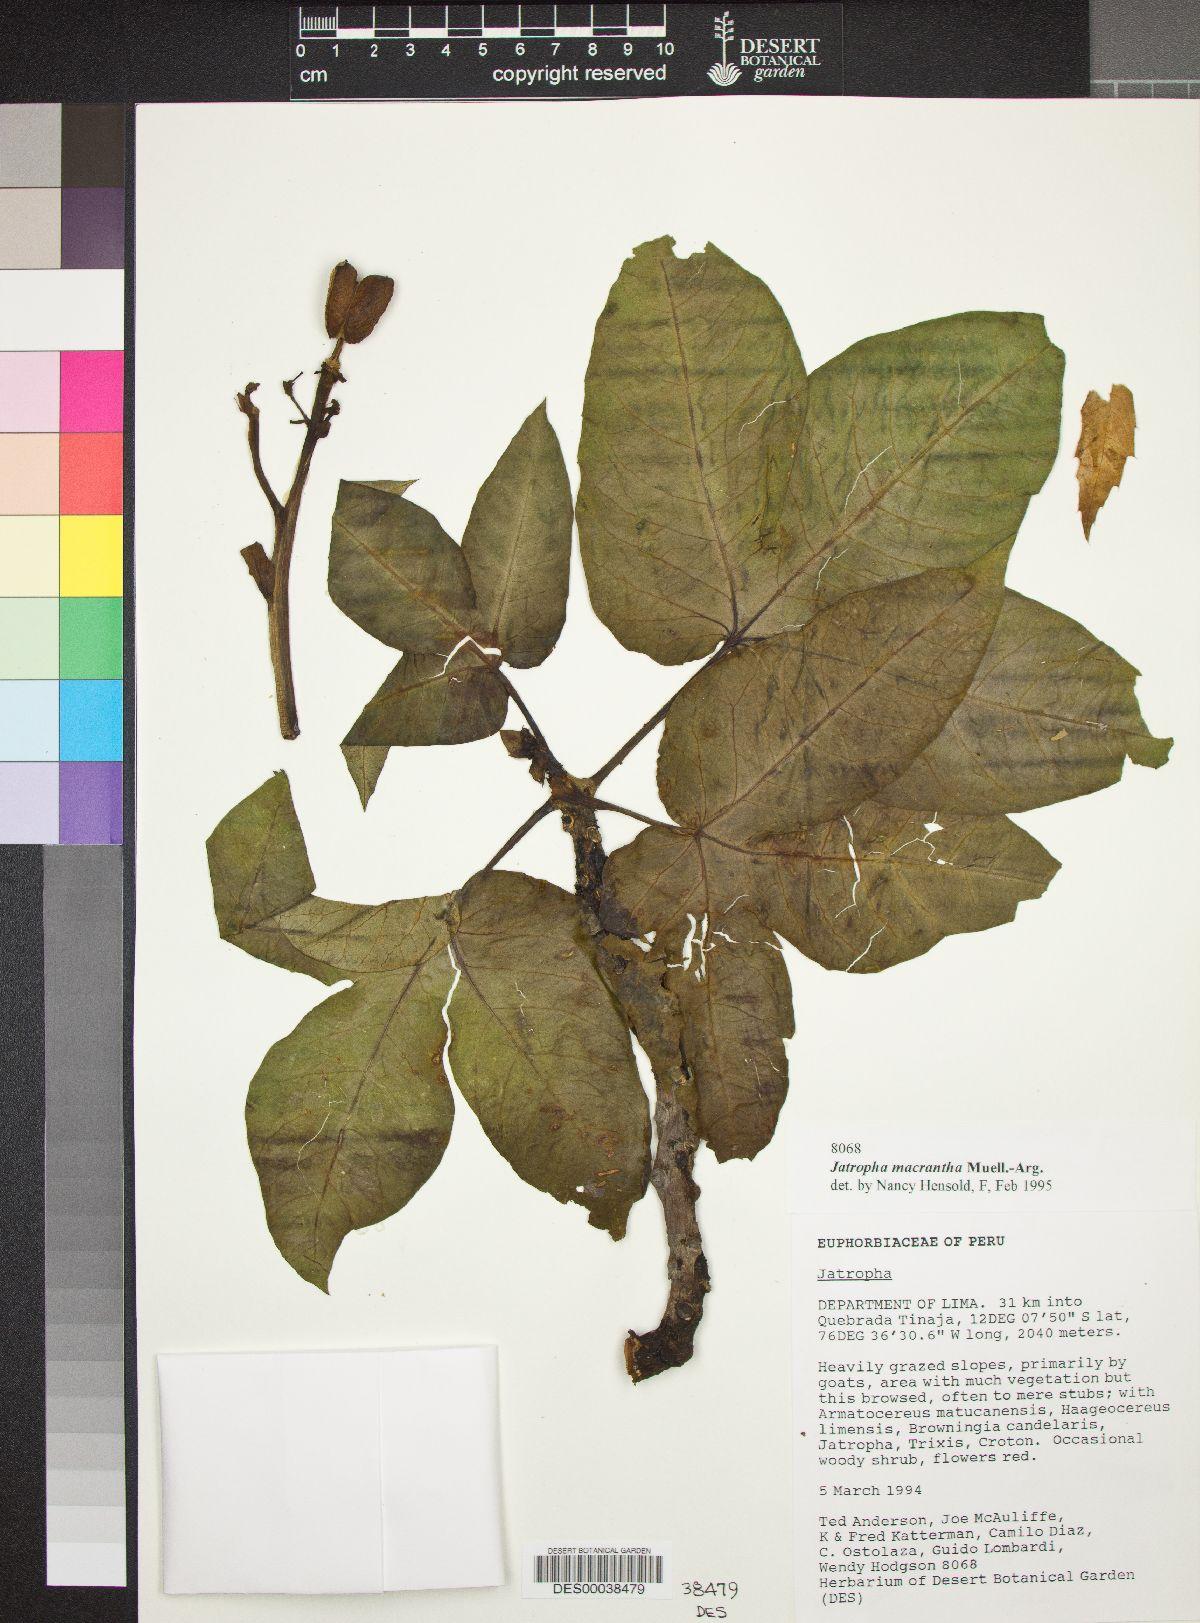 Jatropha macrantha image